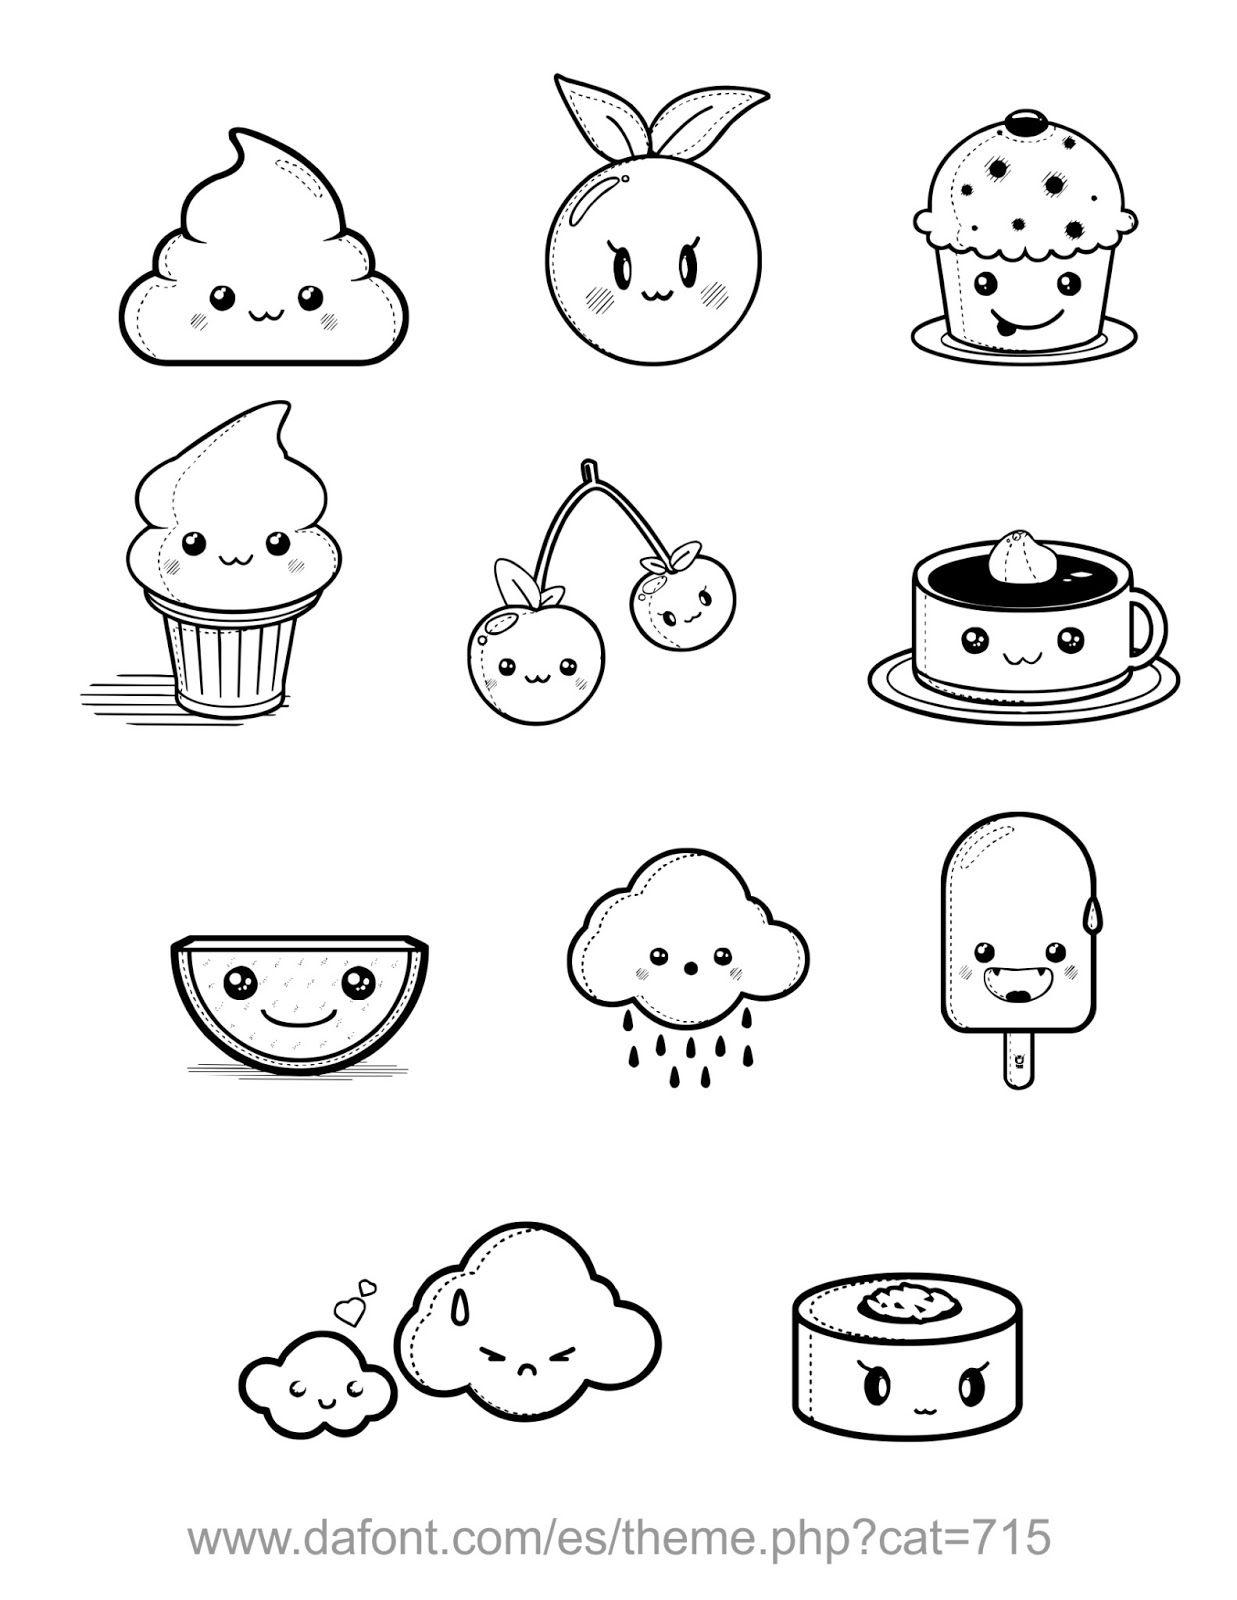 Ilustraciones Dibujos Comida Garabatos Lindos Dibujos Kawaii